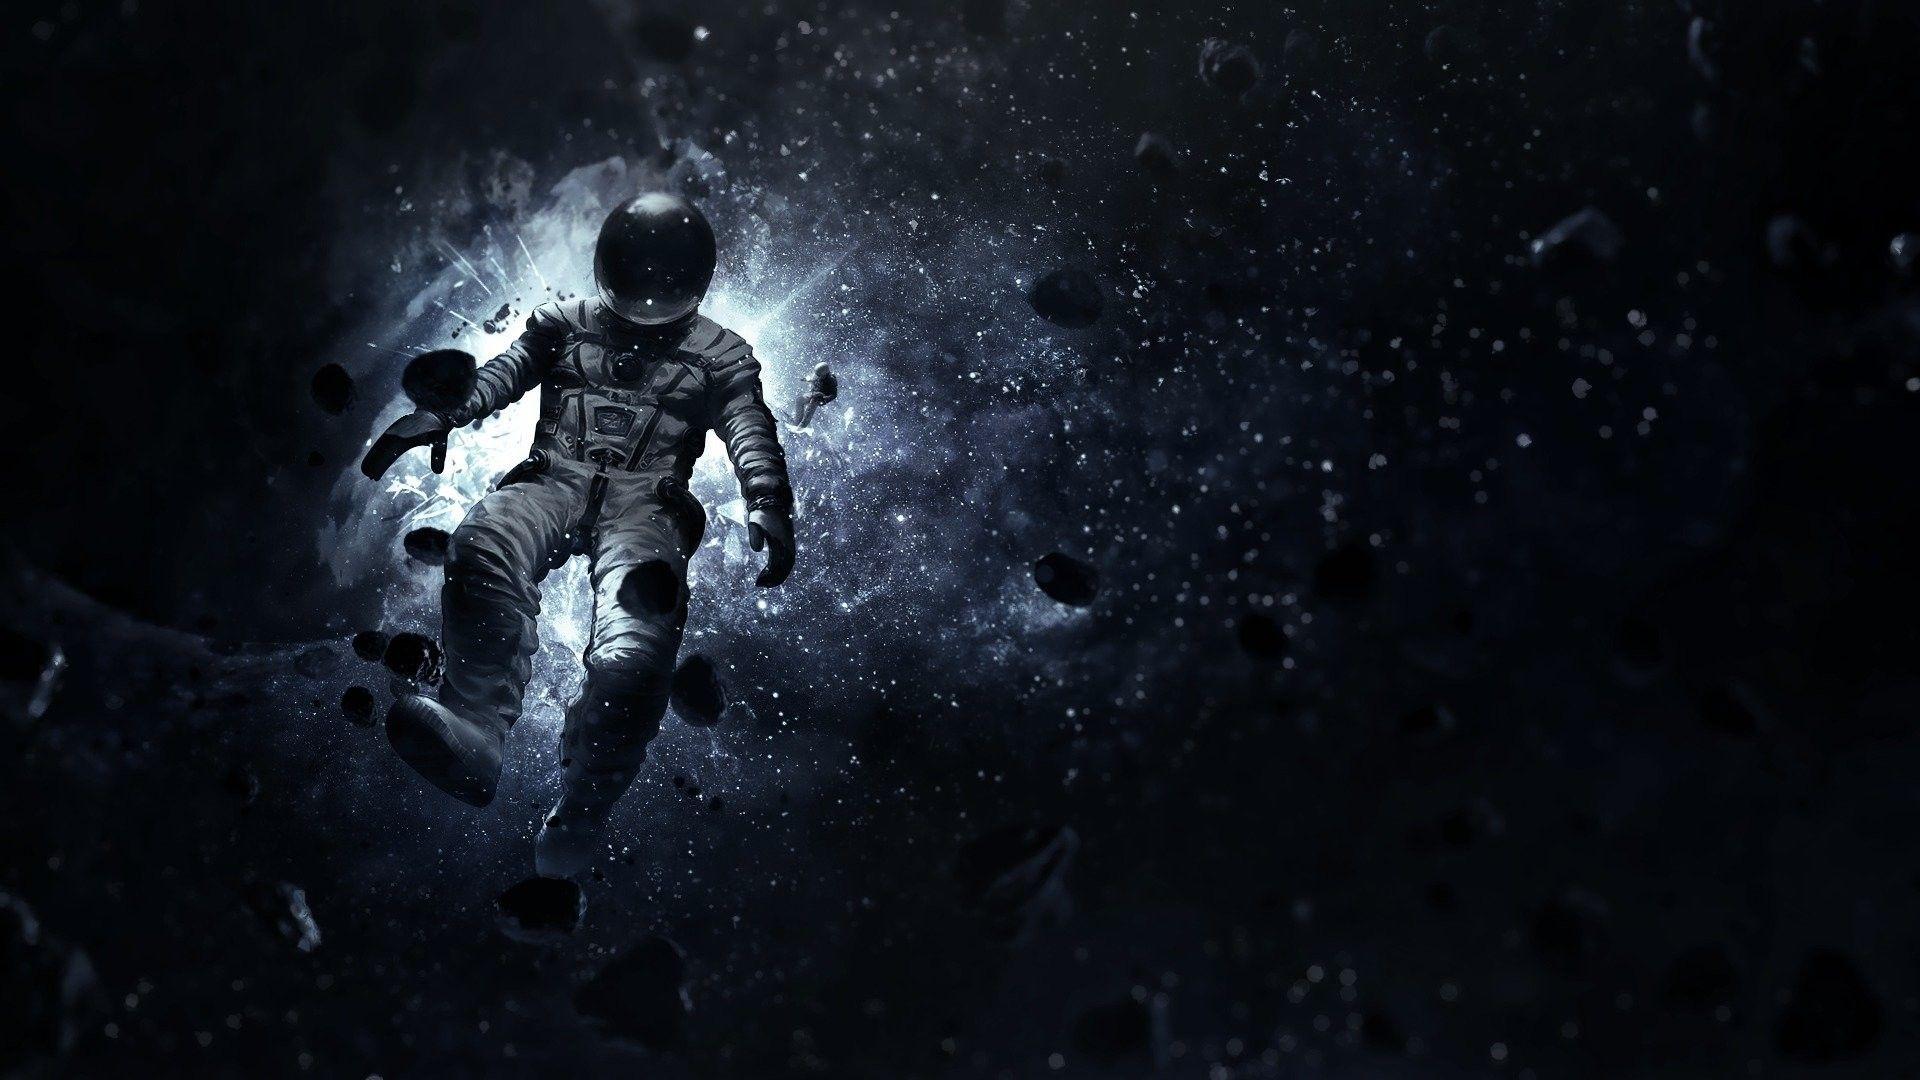 Res 1920x1080, astronauta papel de parede hd 715519